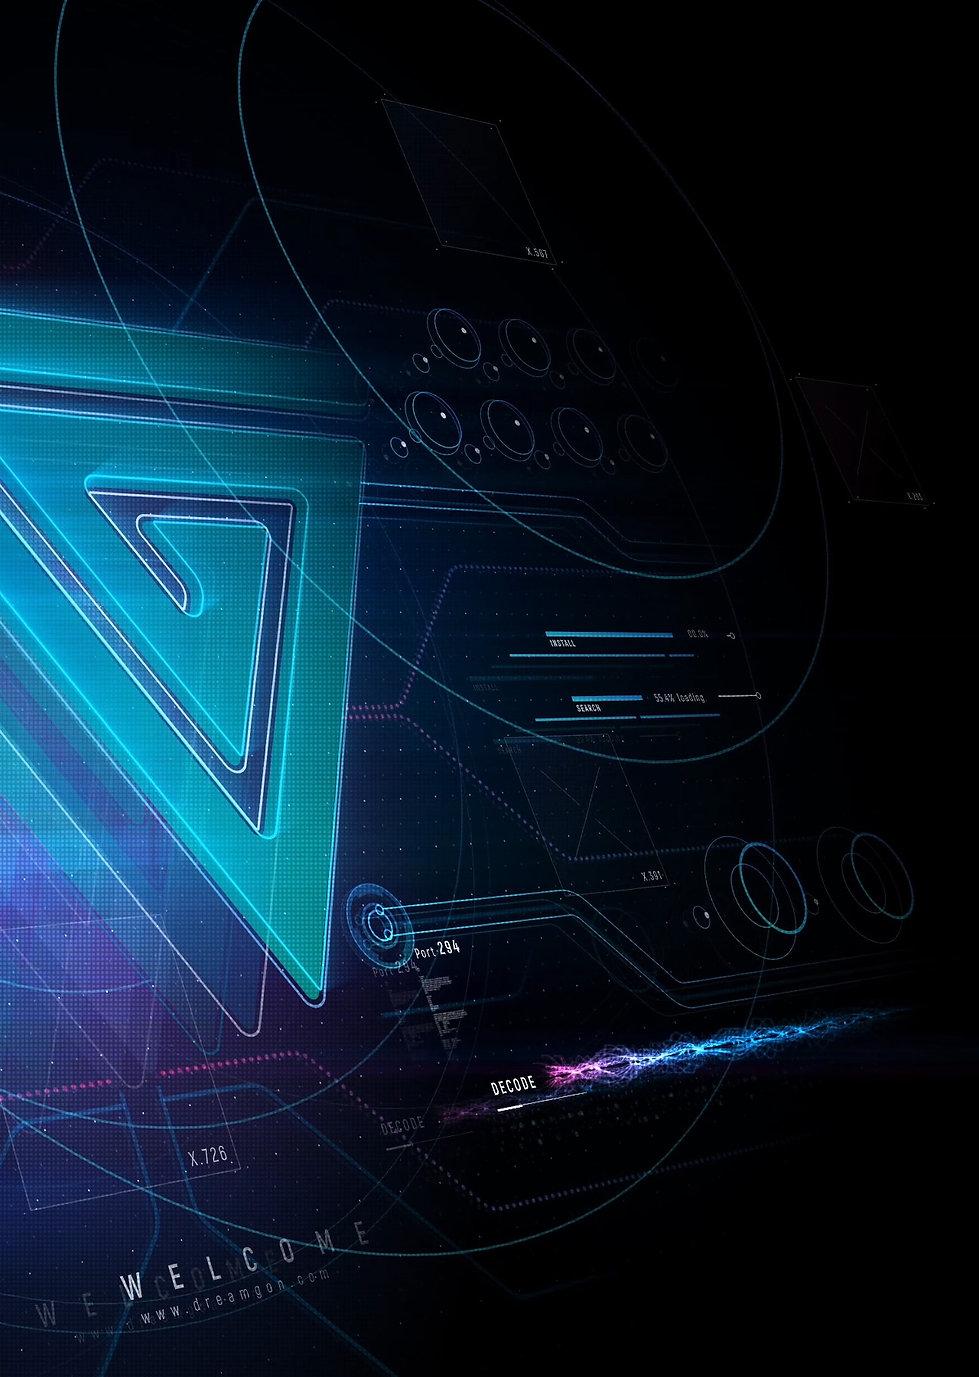 Dreamgon Ventuz Futuristic Sci-Fi Dashboard Realtime Data